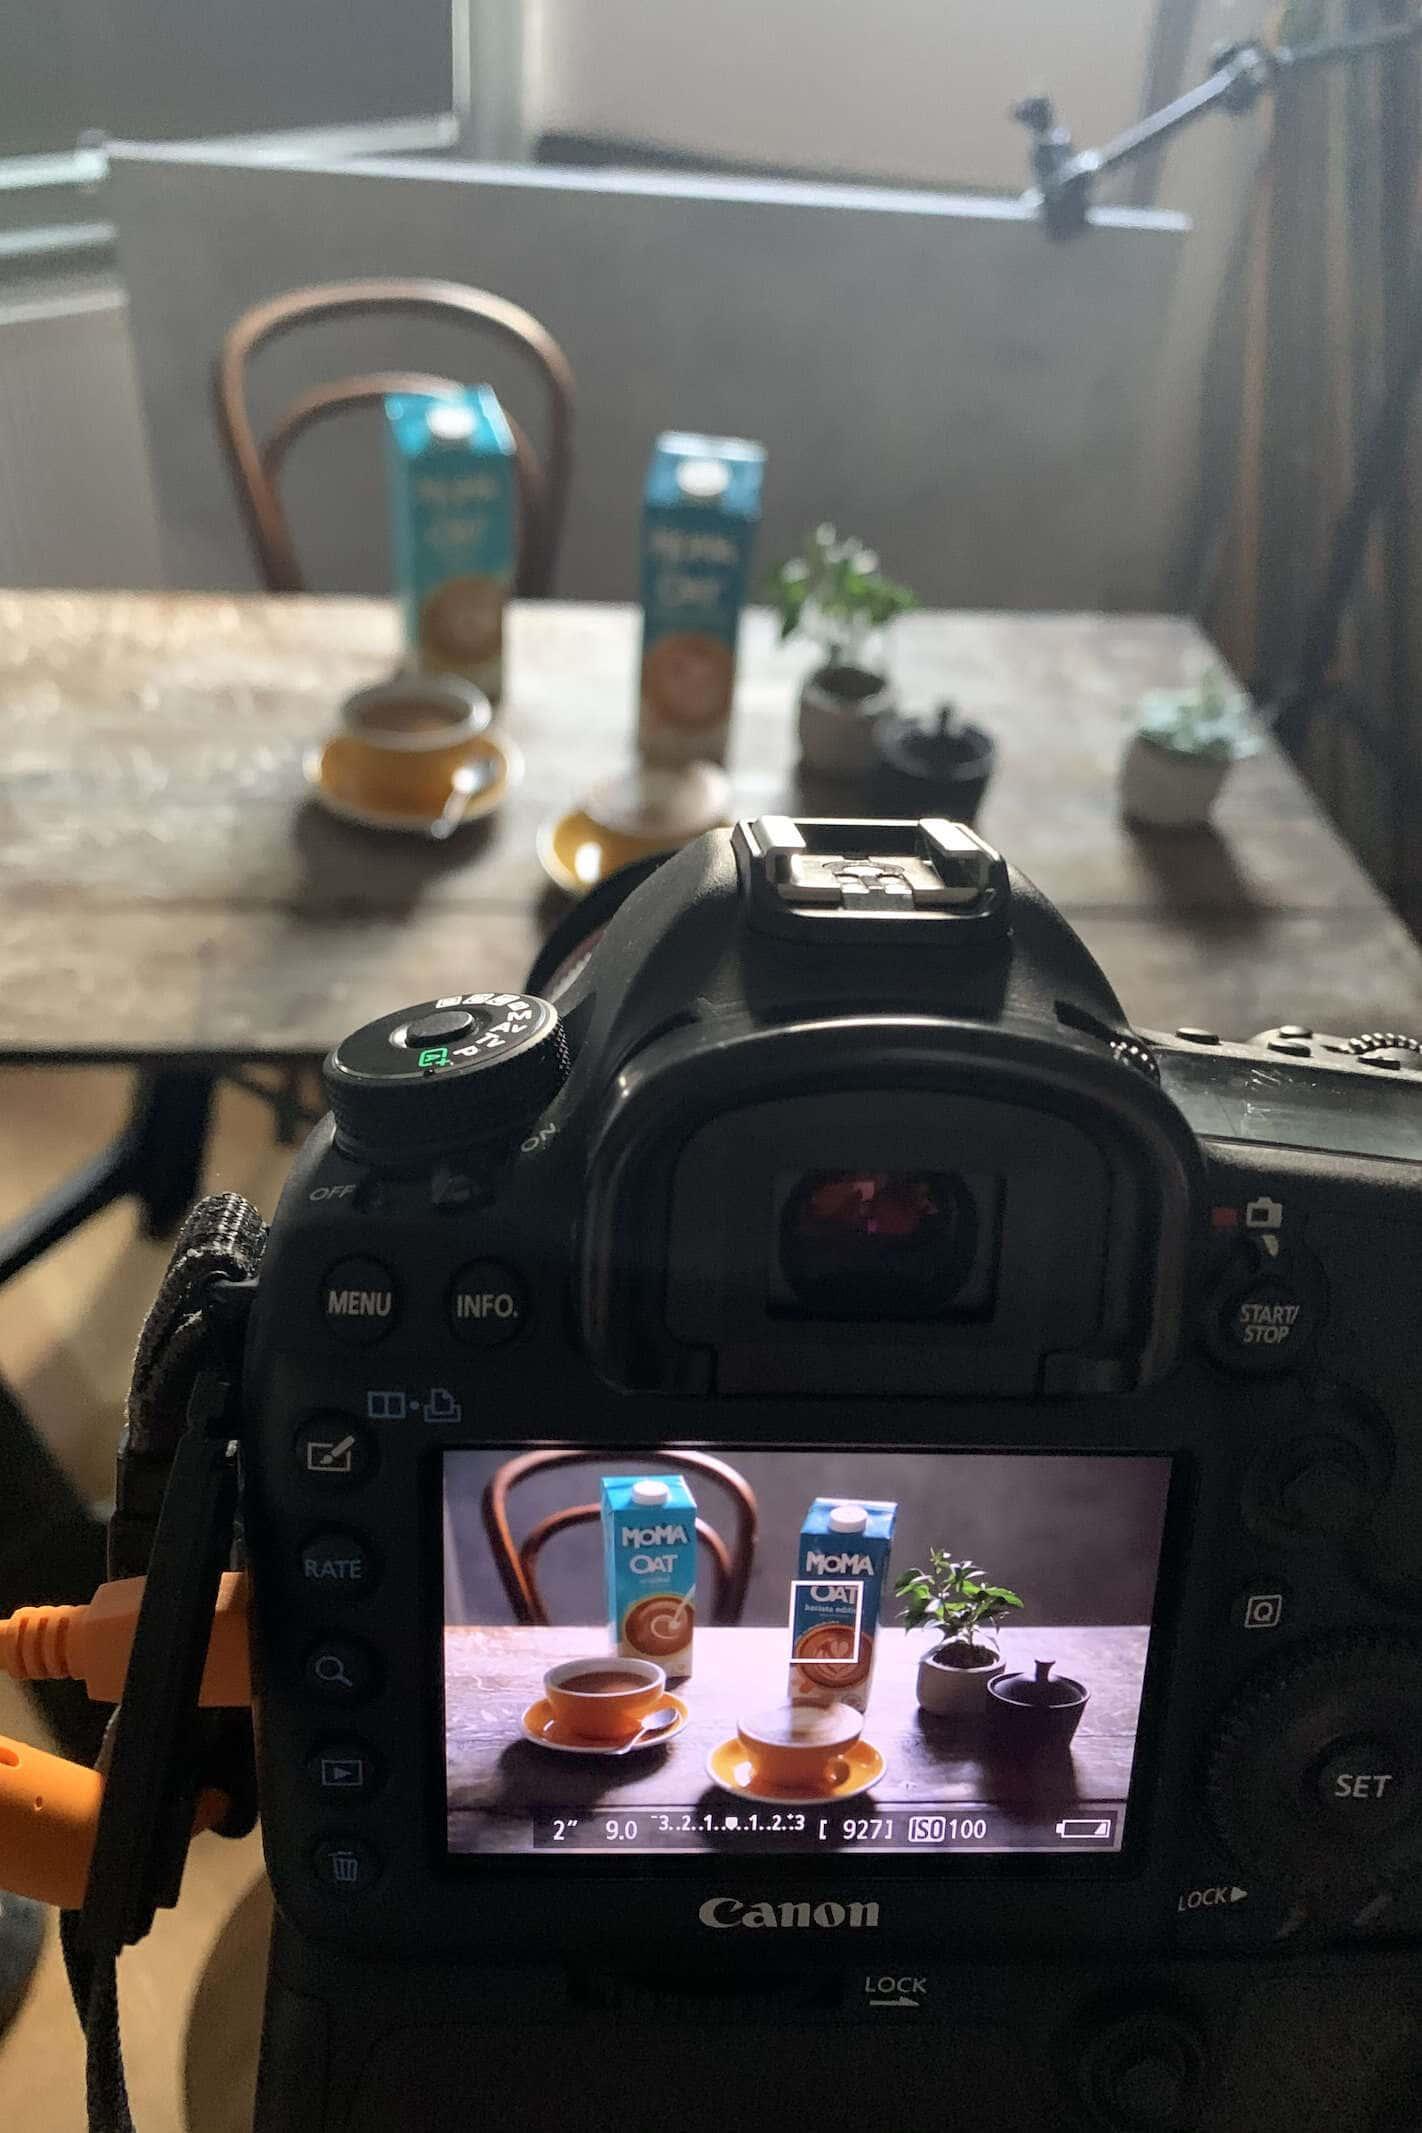 image on back of camera in studio